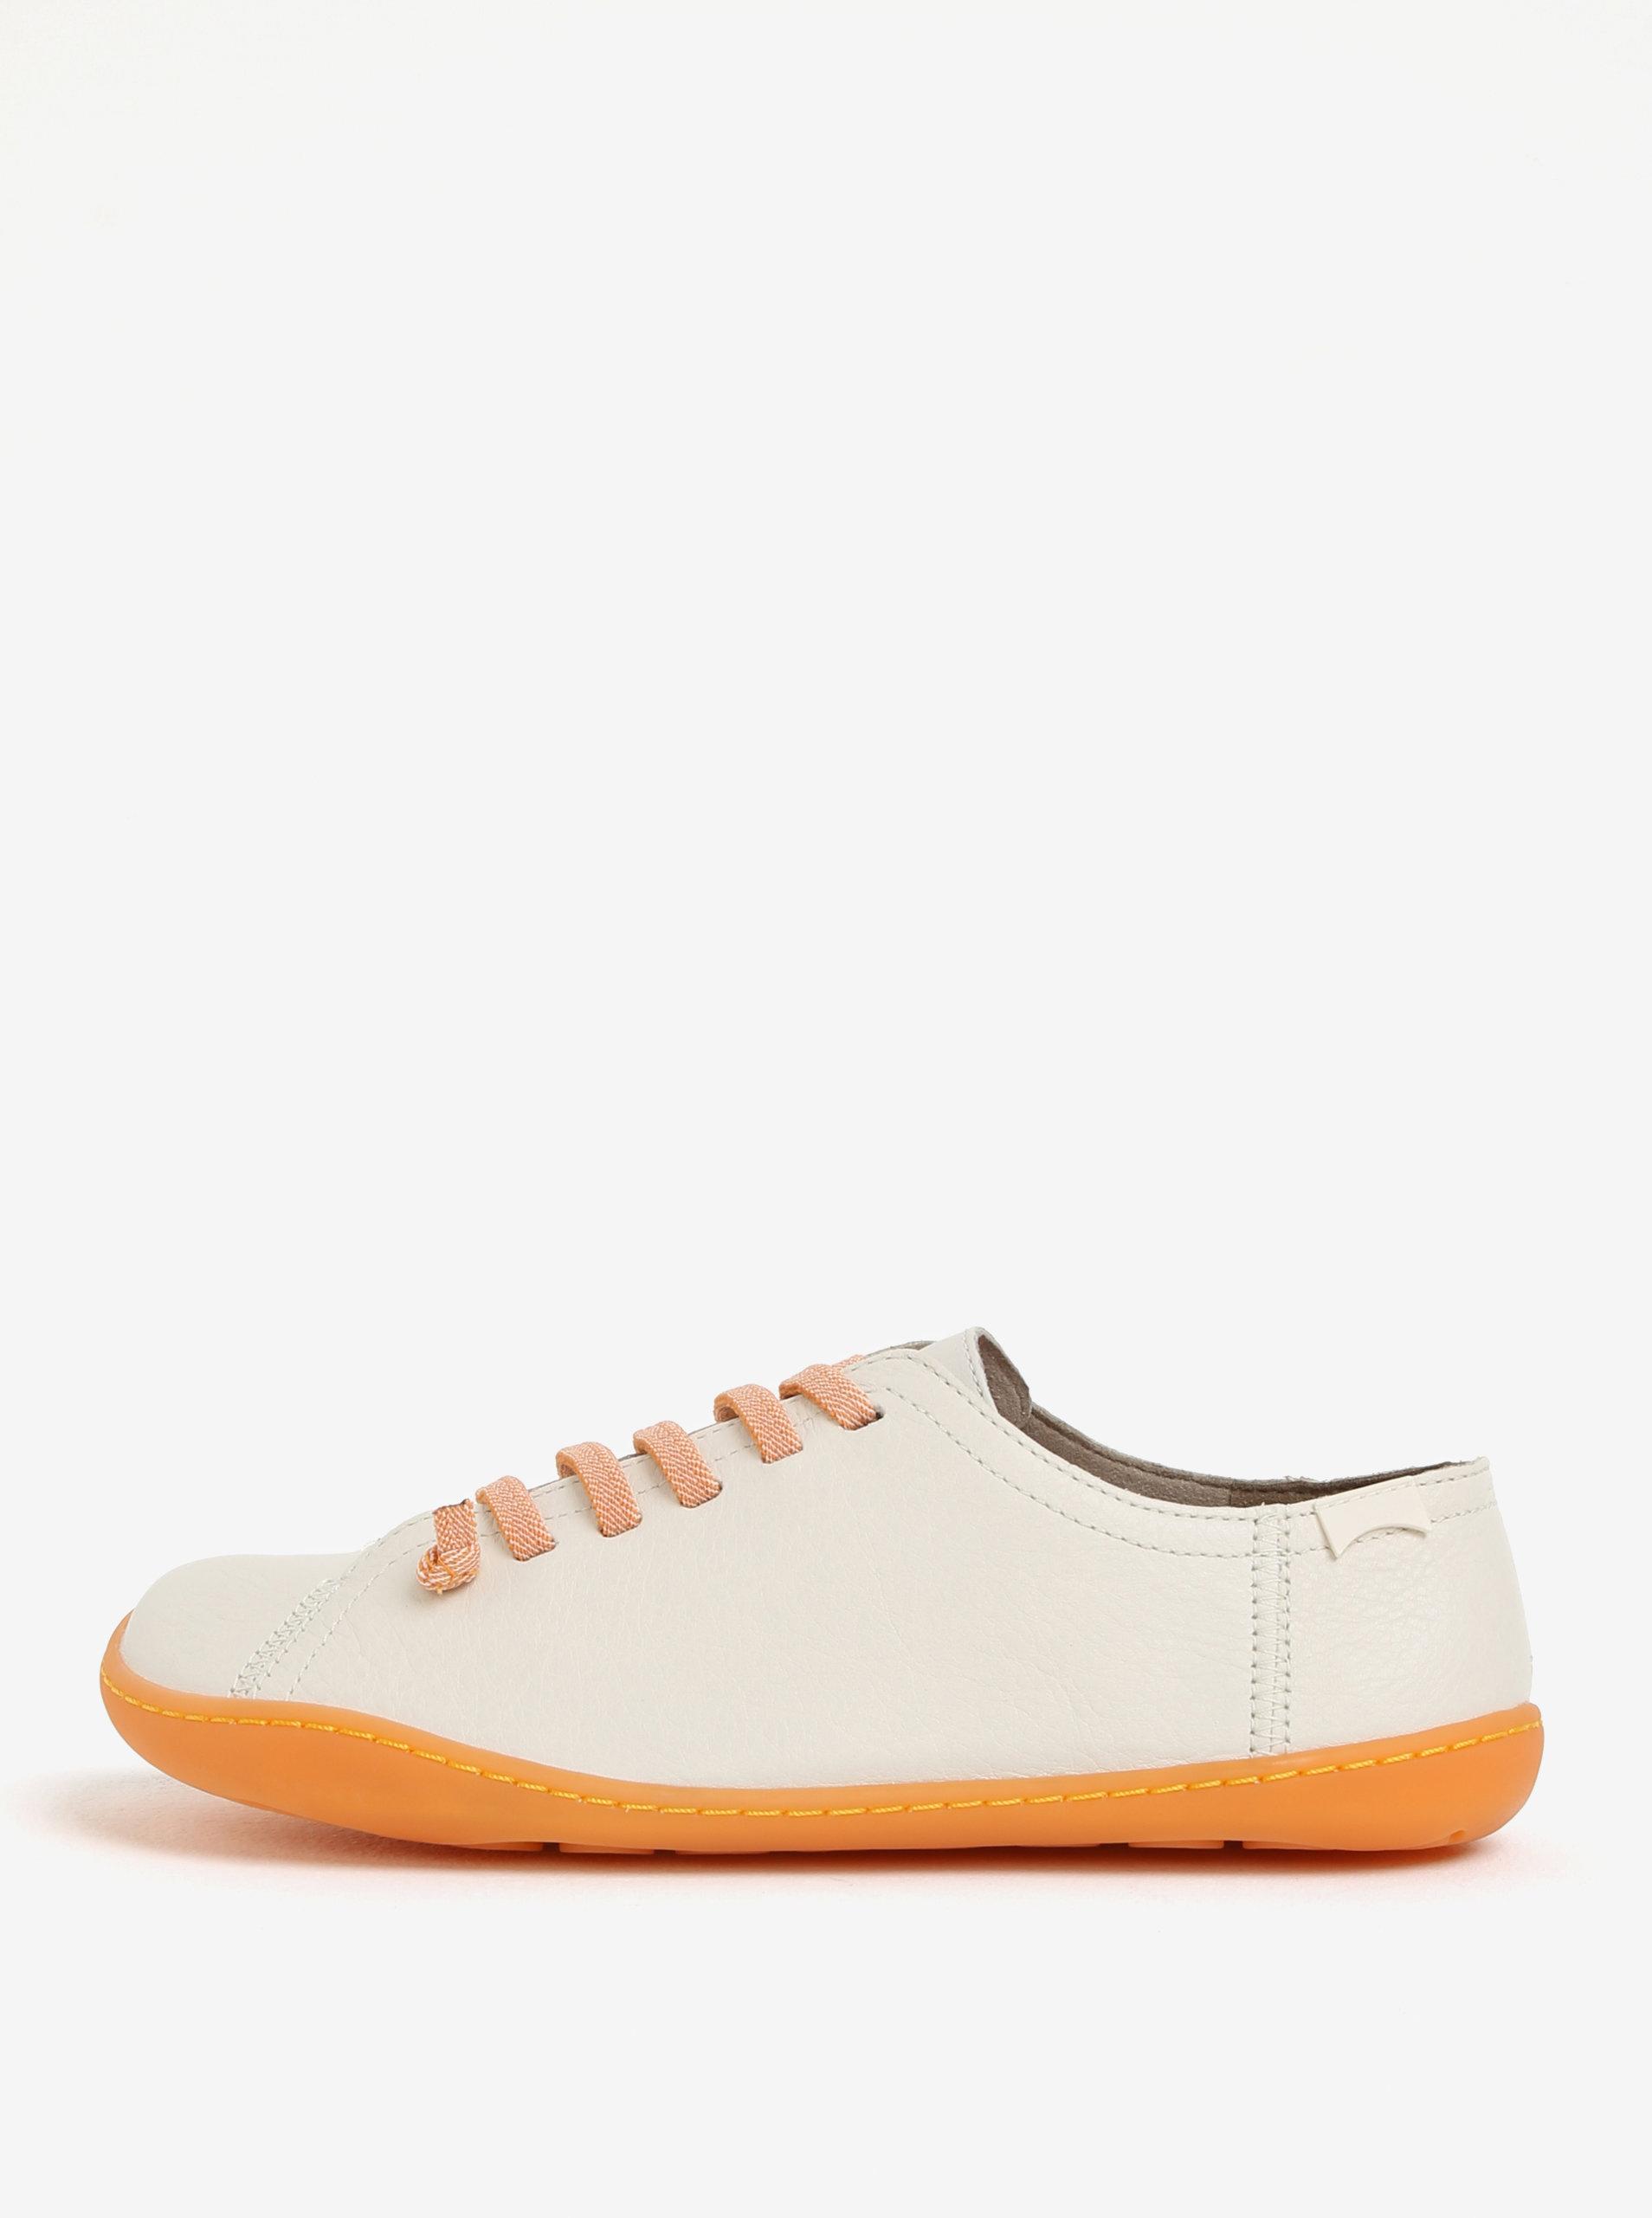 ca2294f2518 Krémové dámské kožené tenisky Camper Peu ...